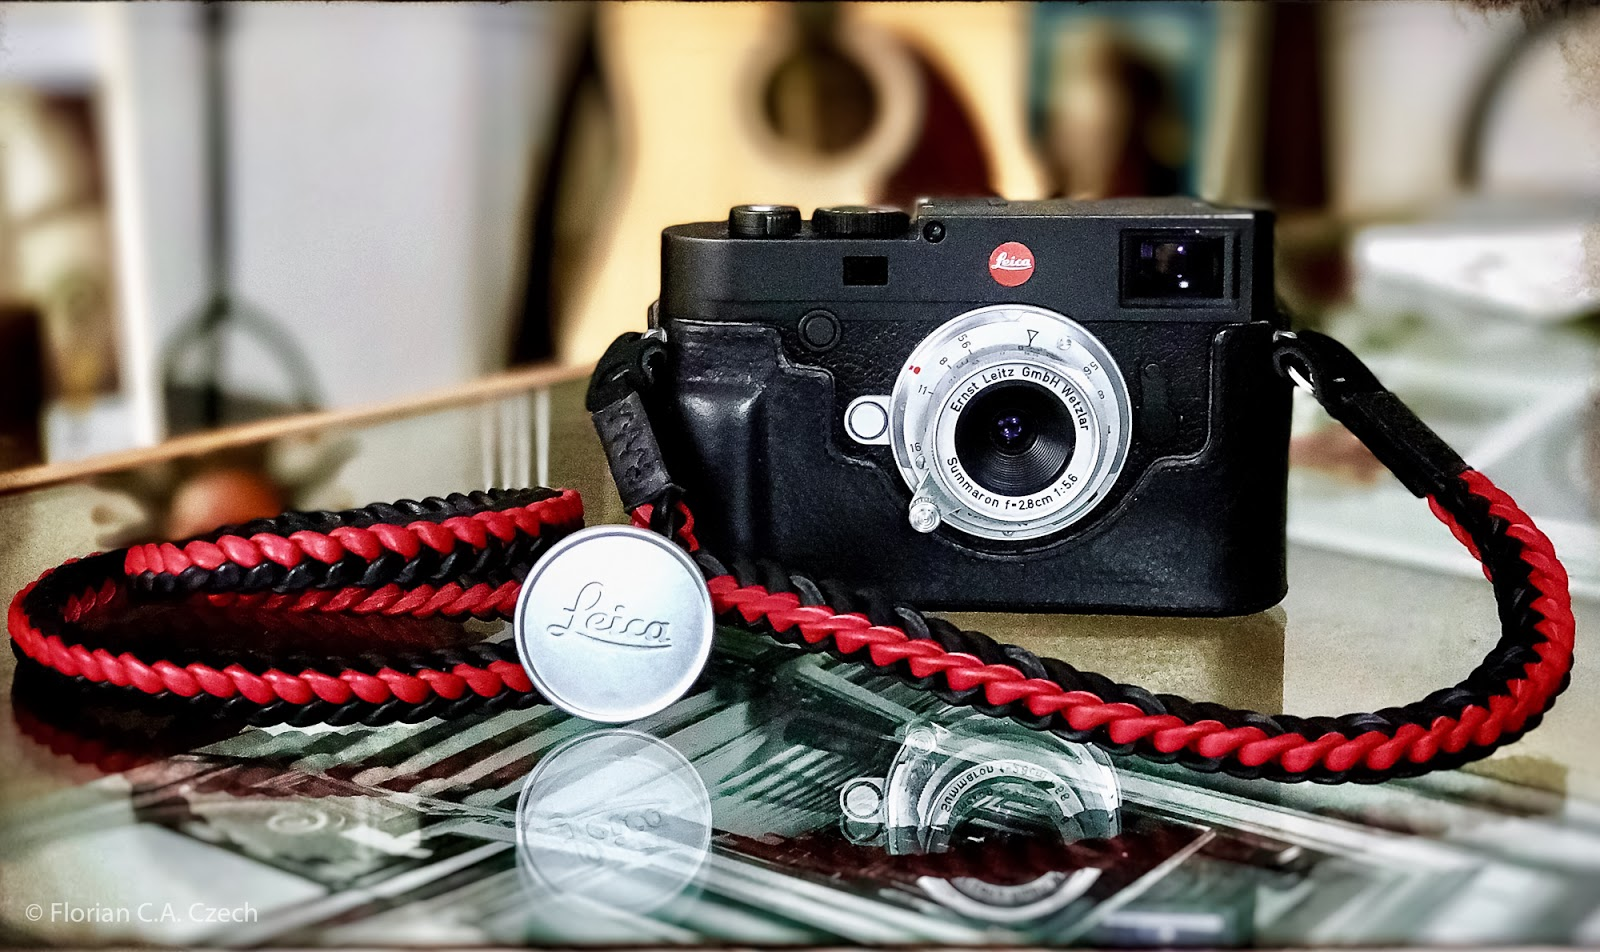 Leica M10 + M 28mm 5.6 Sumaron Barton Gurt